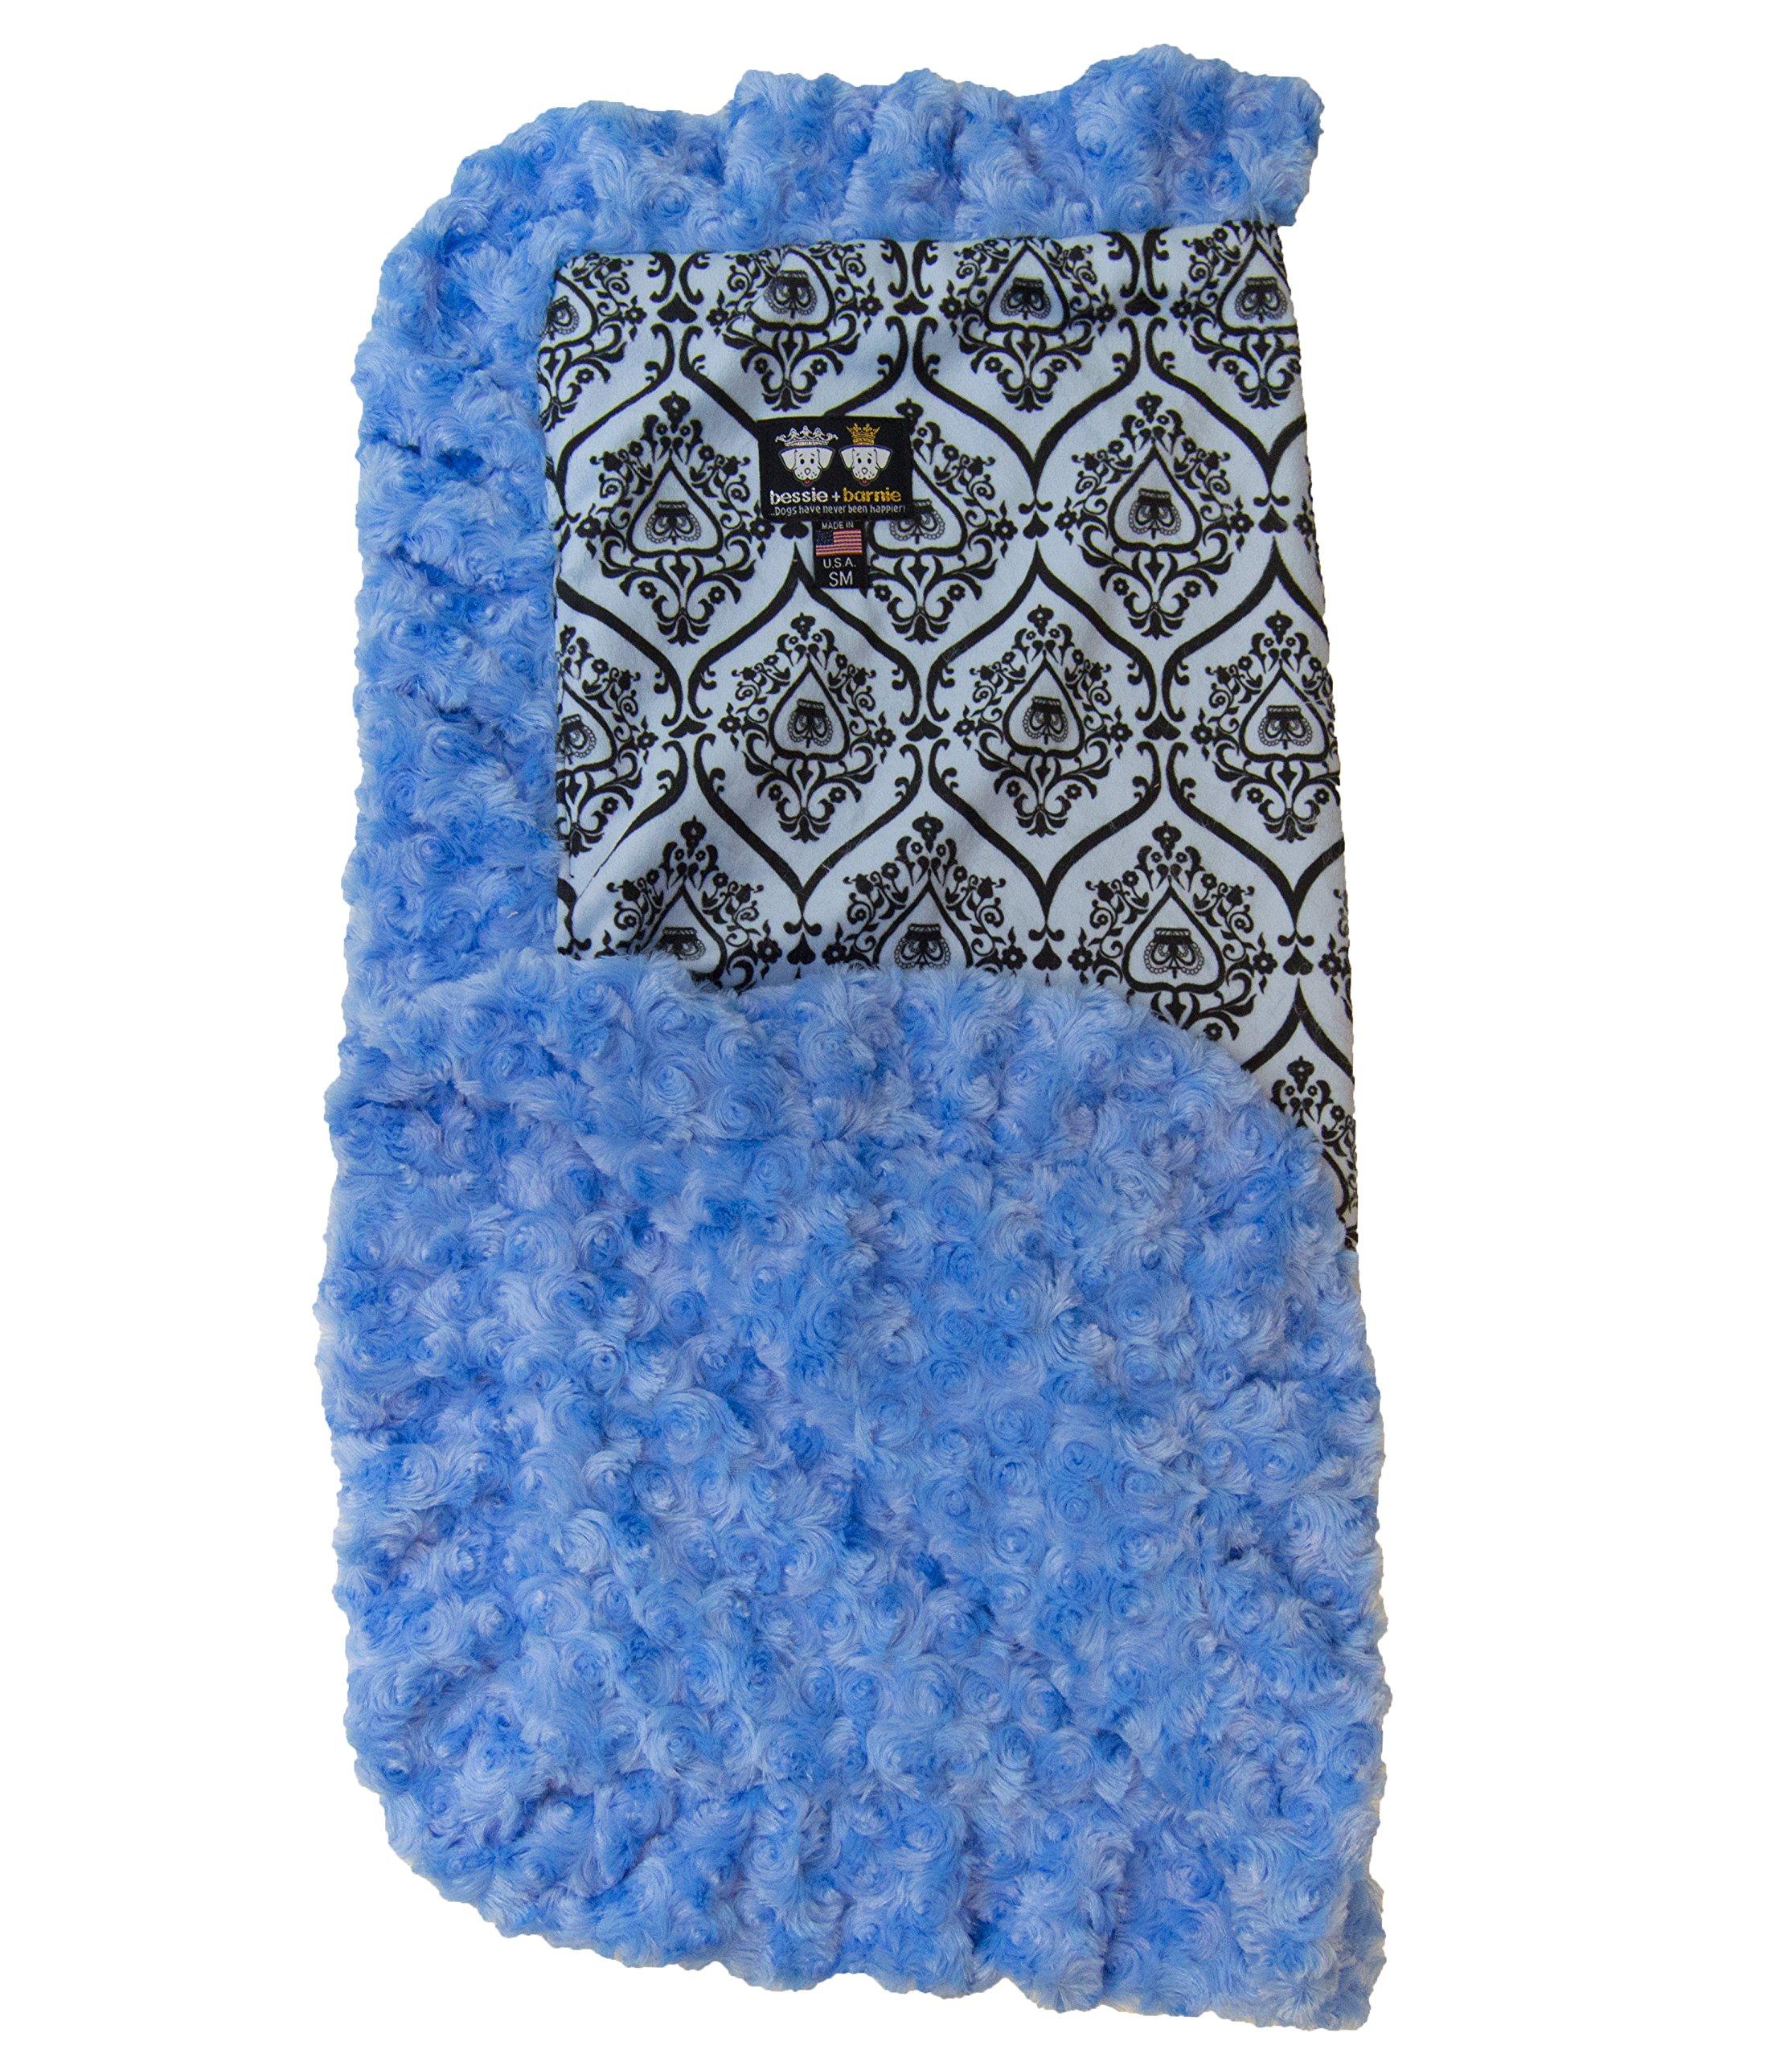 BESSIE AND BARNIE Blue Sky/Versailles Blue Luxury Ultra Plush Faux Fur Pet, Dog, Cat, Puppy Super Soft Reversible Blanket (Multiple Sizes)